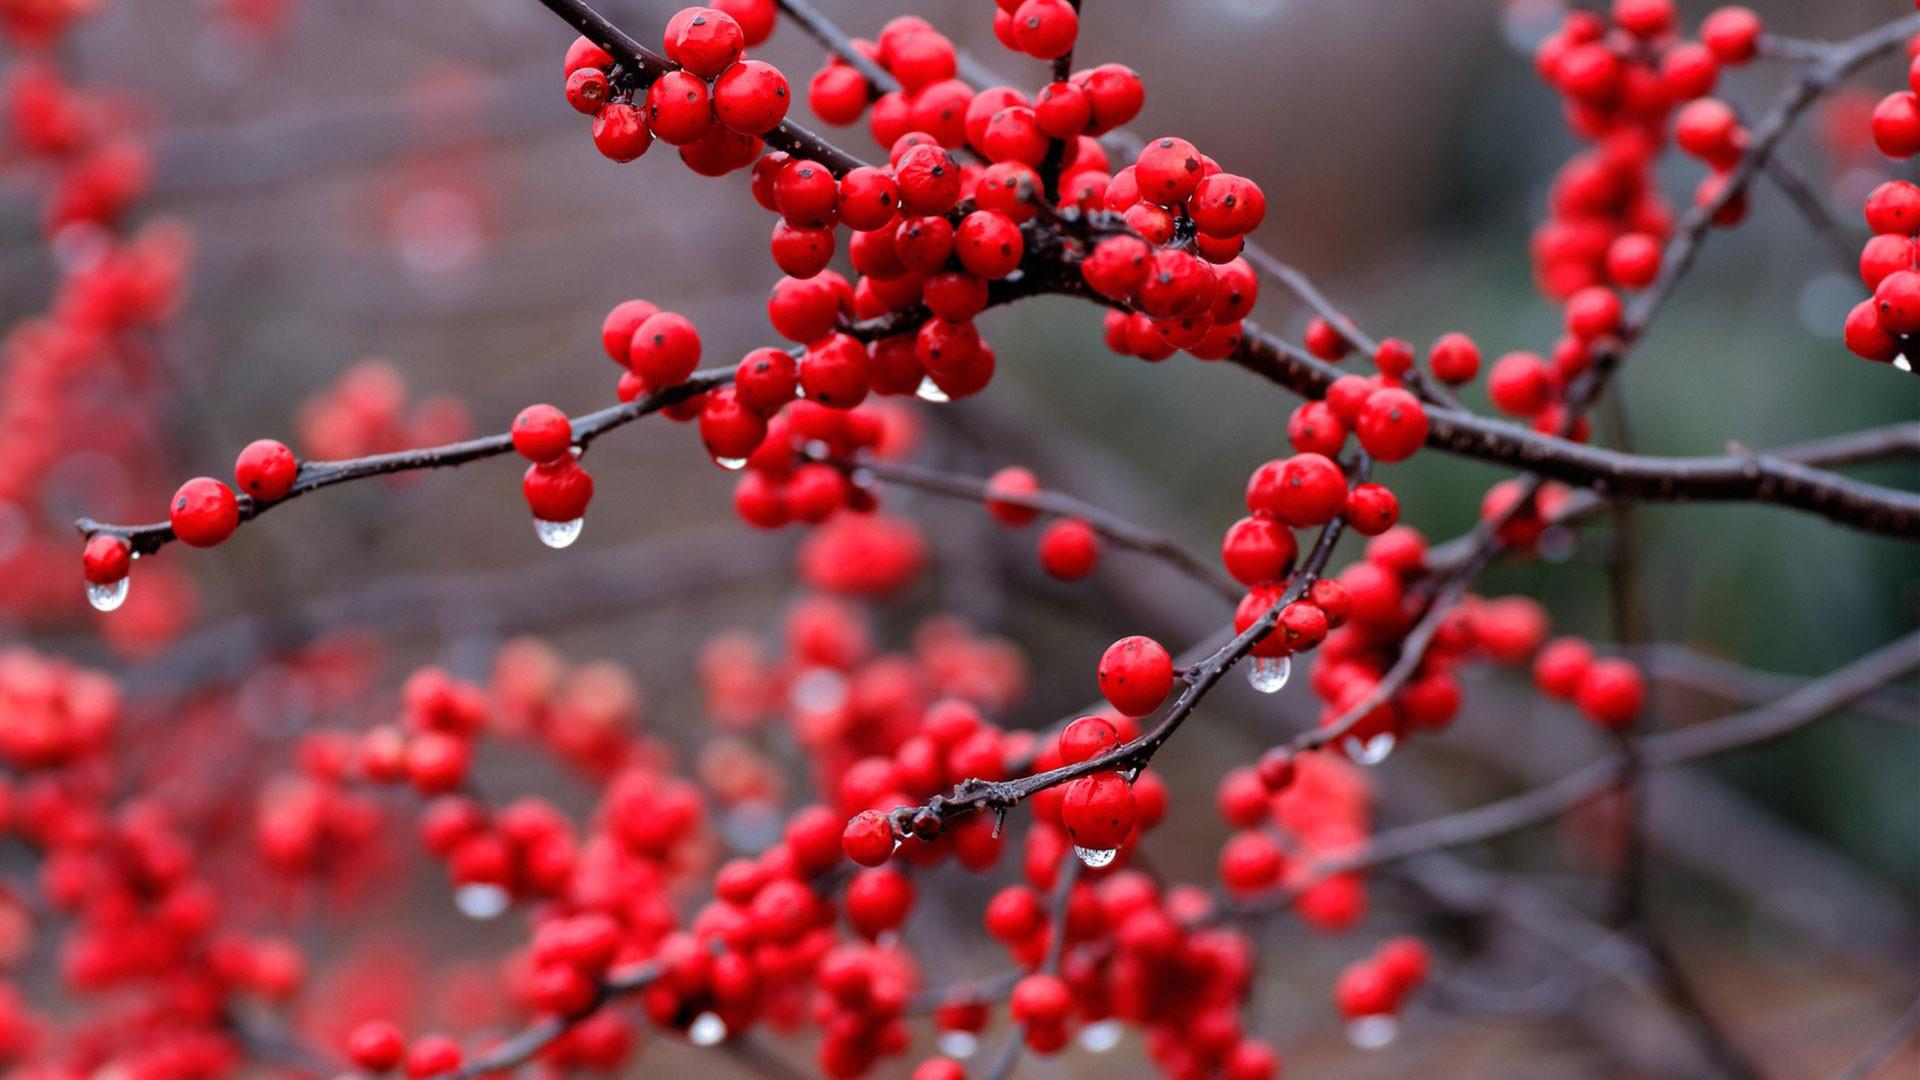 hd pics photos fruits red berries in nature desktop background wallpaper